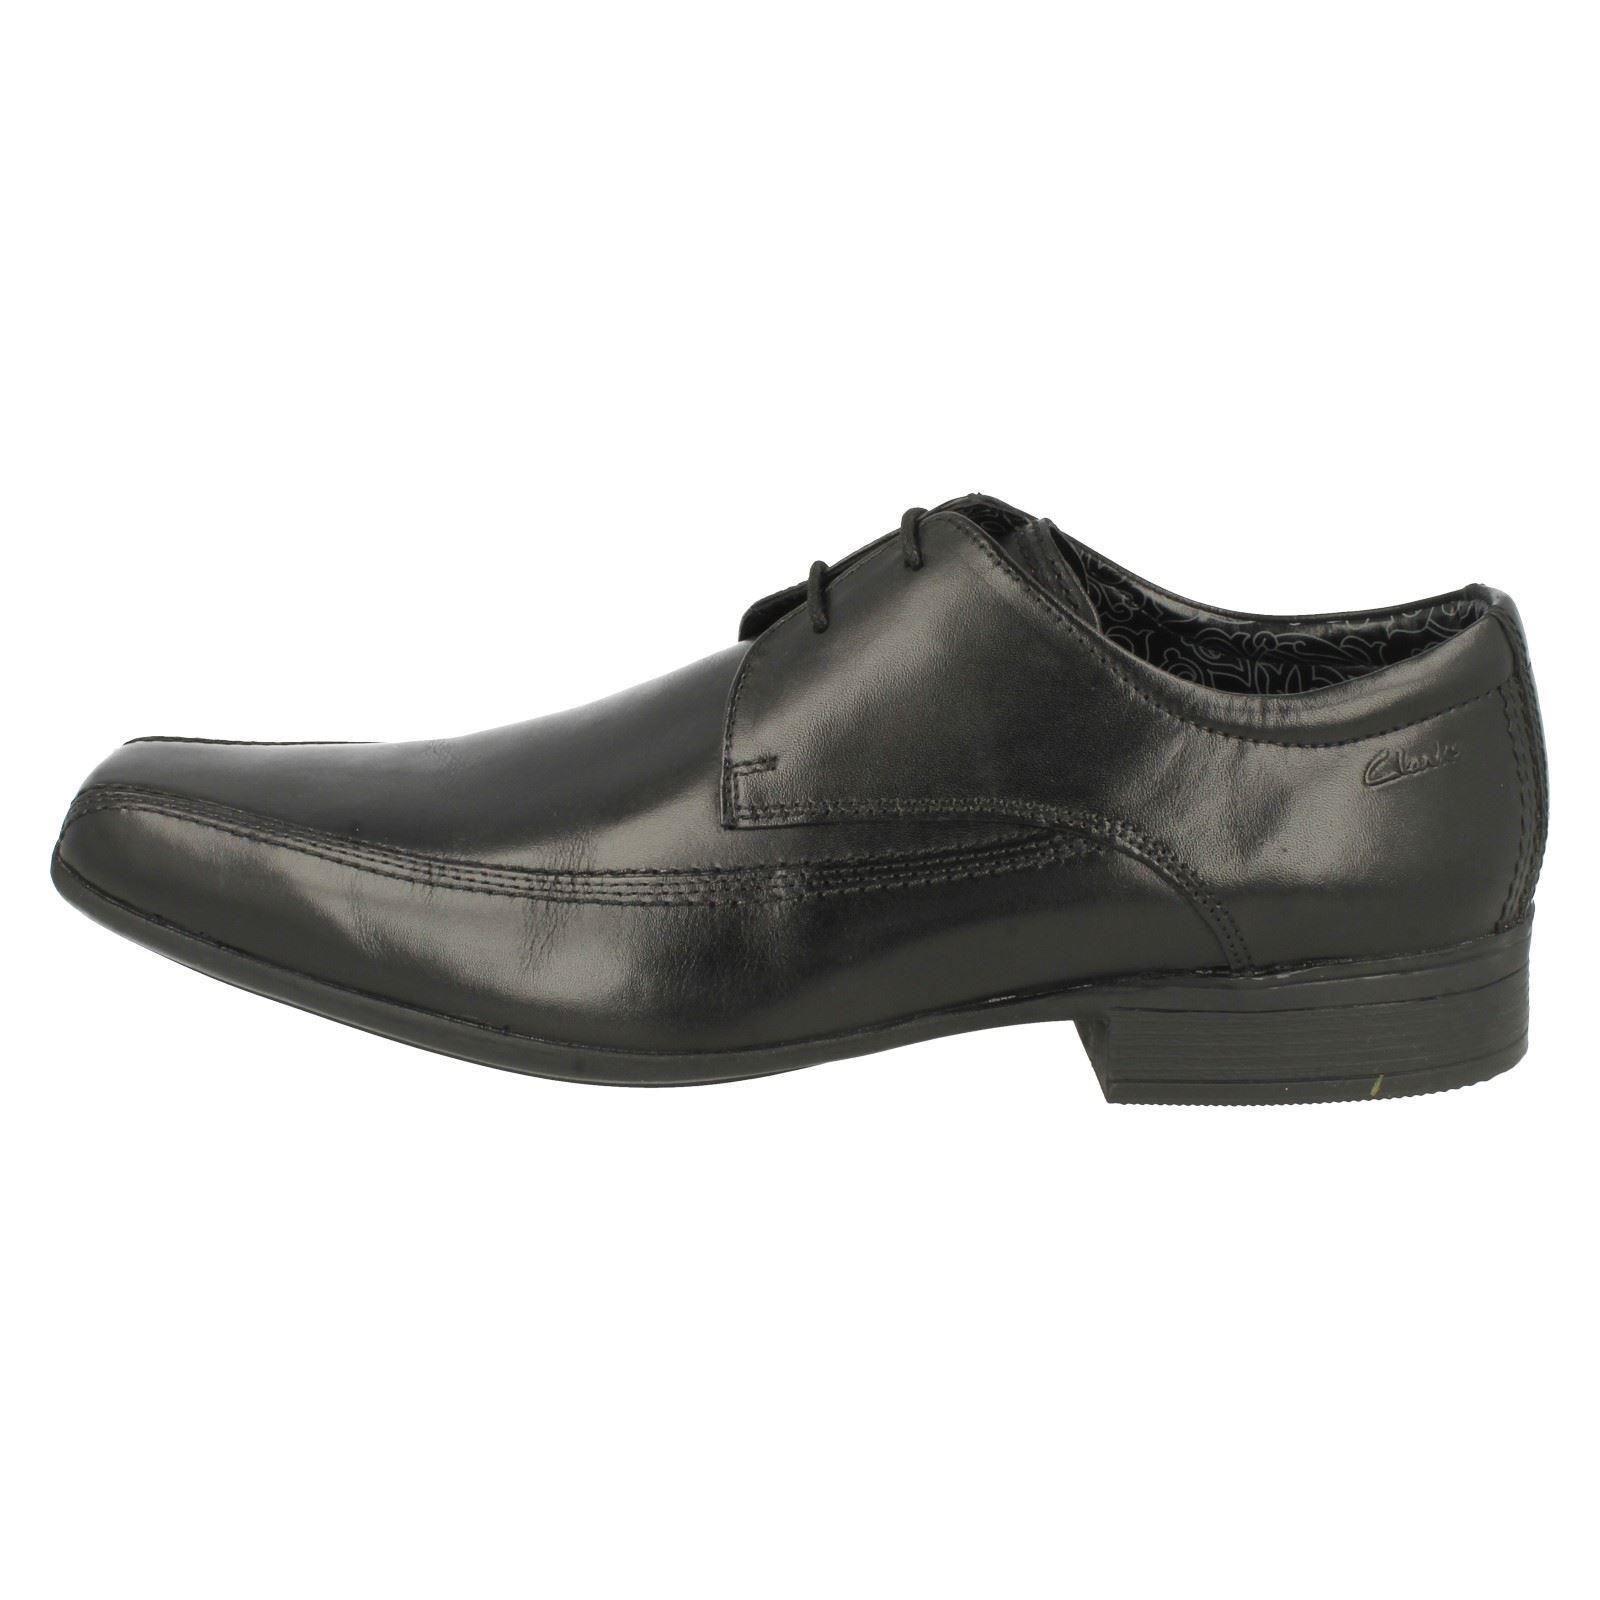 Clarks Herren förmliche Schuhe' Schuhe' förmliche Aze Tag' 17a395